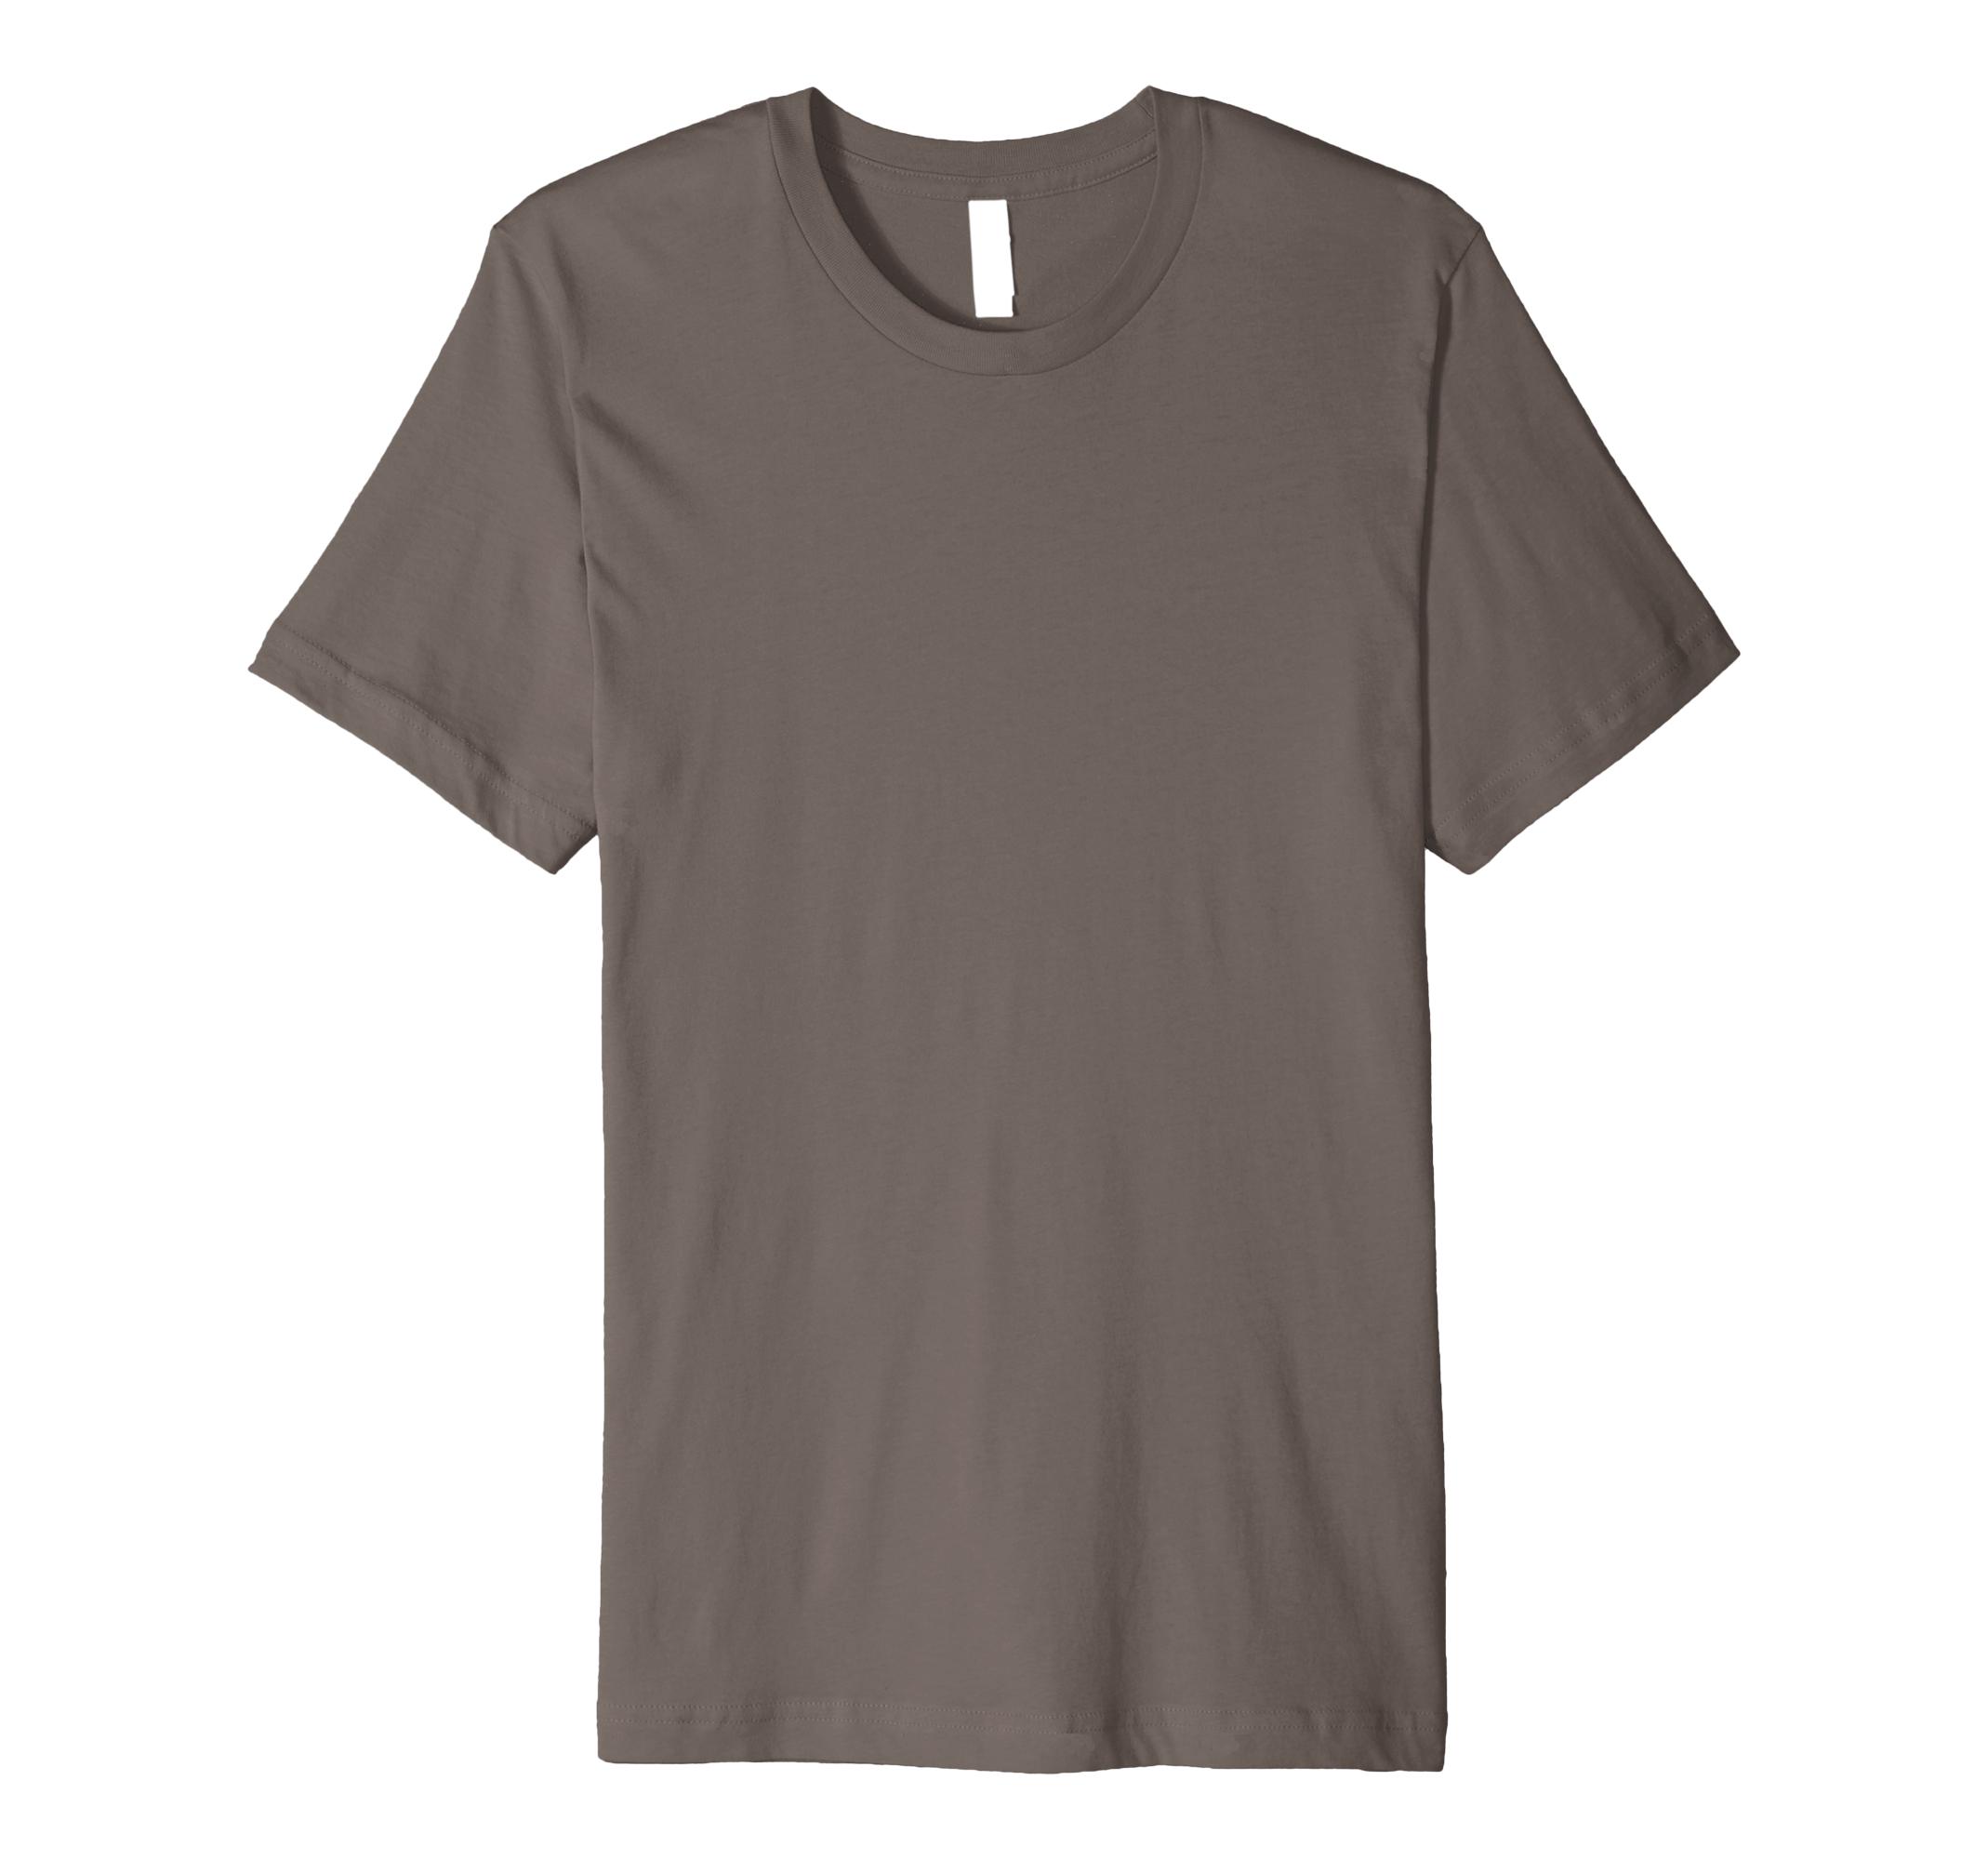 Croix US Virgin Islands Adult Mens Size M Medium Shirt NEW St